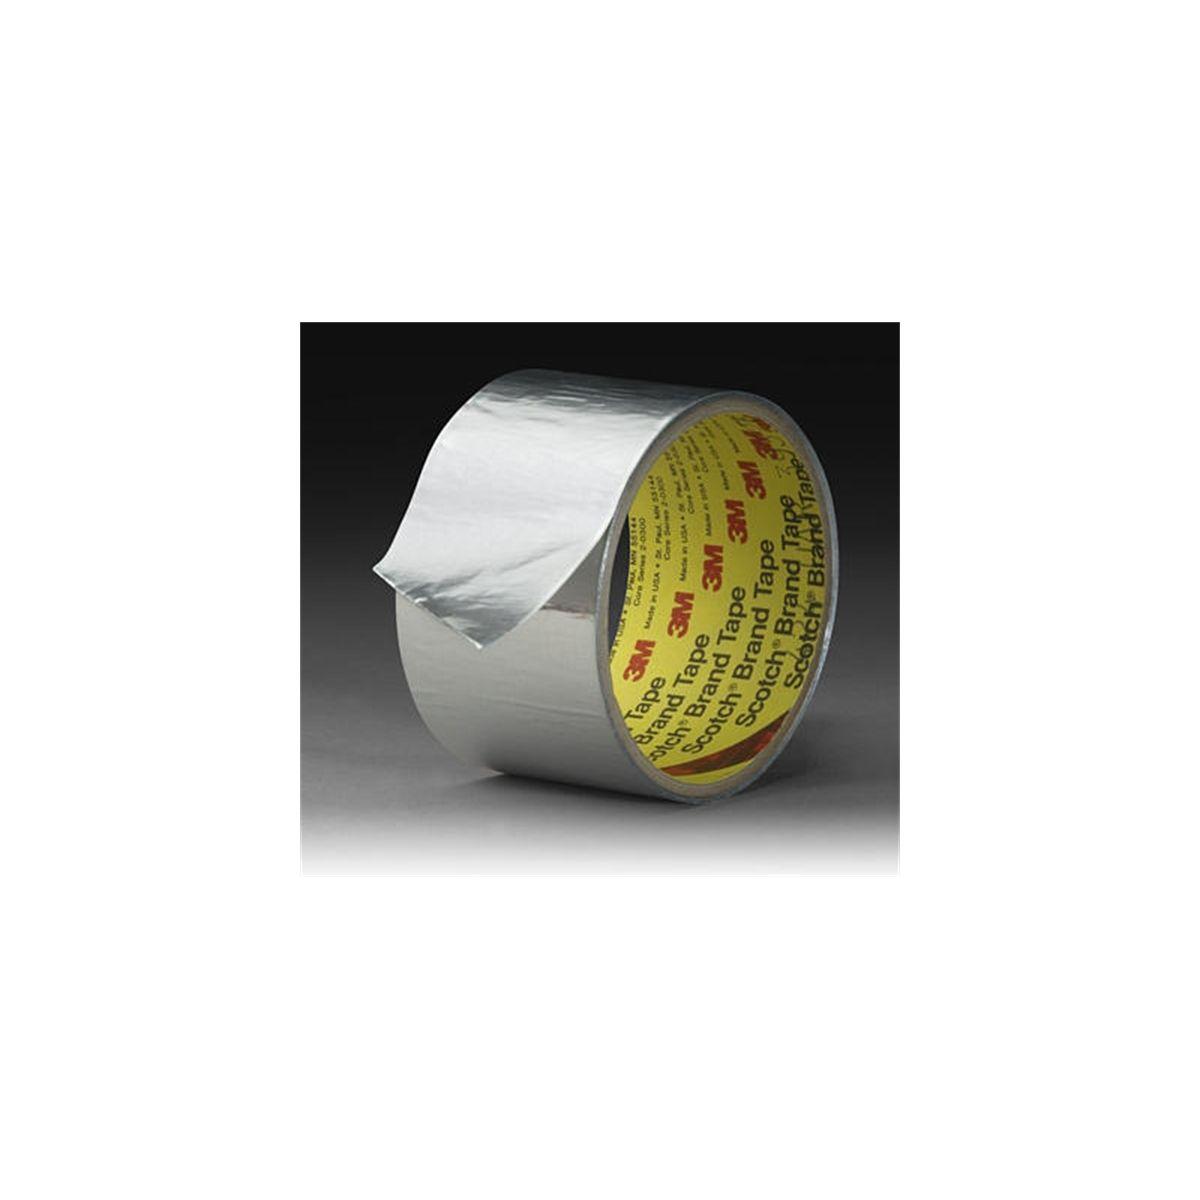 3m auto body masking tape